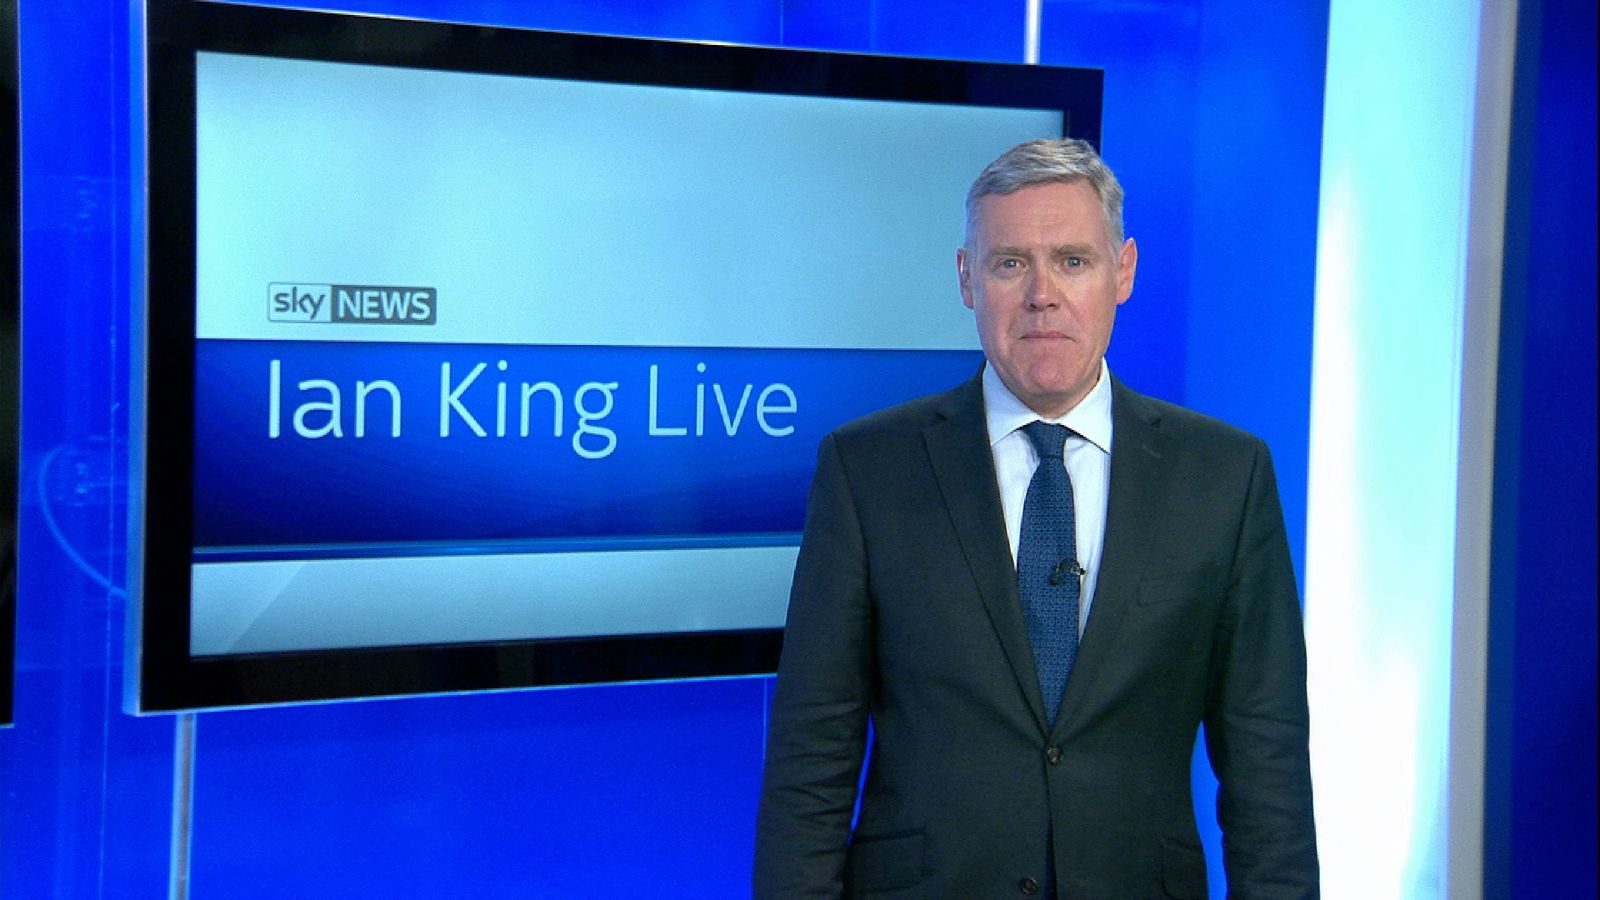 sky news live - photo #31